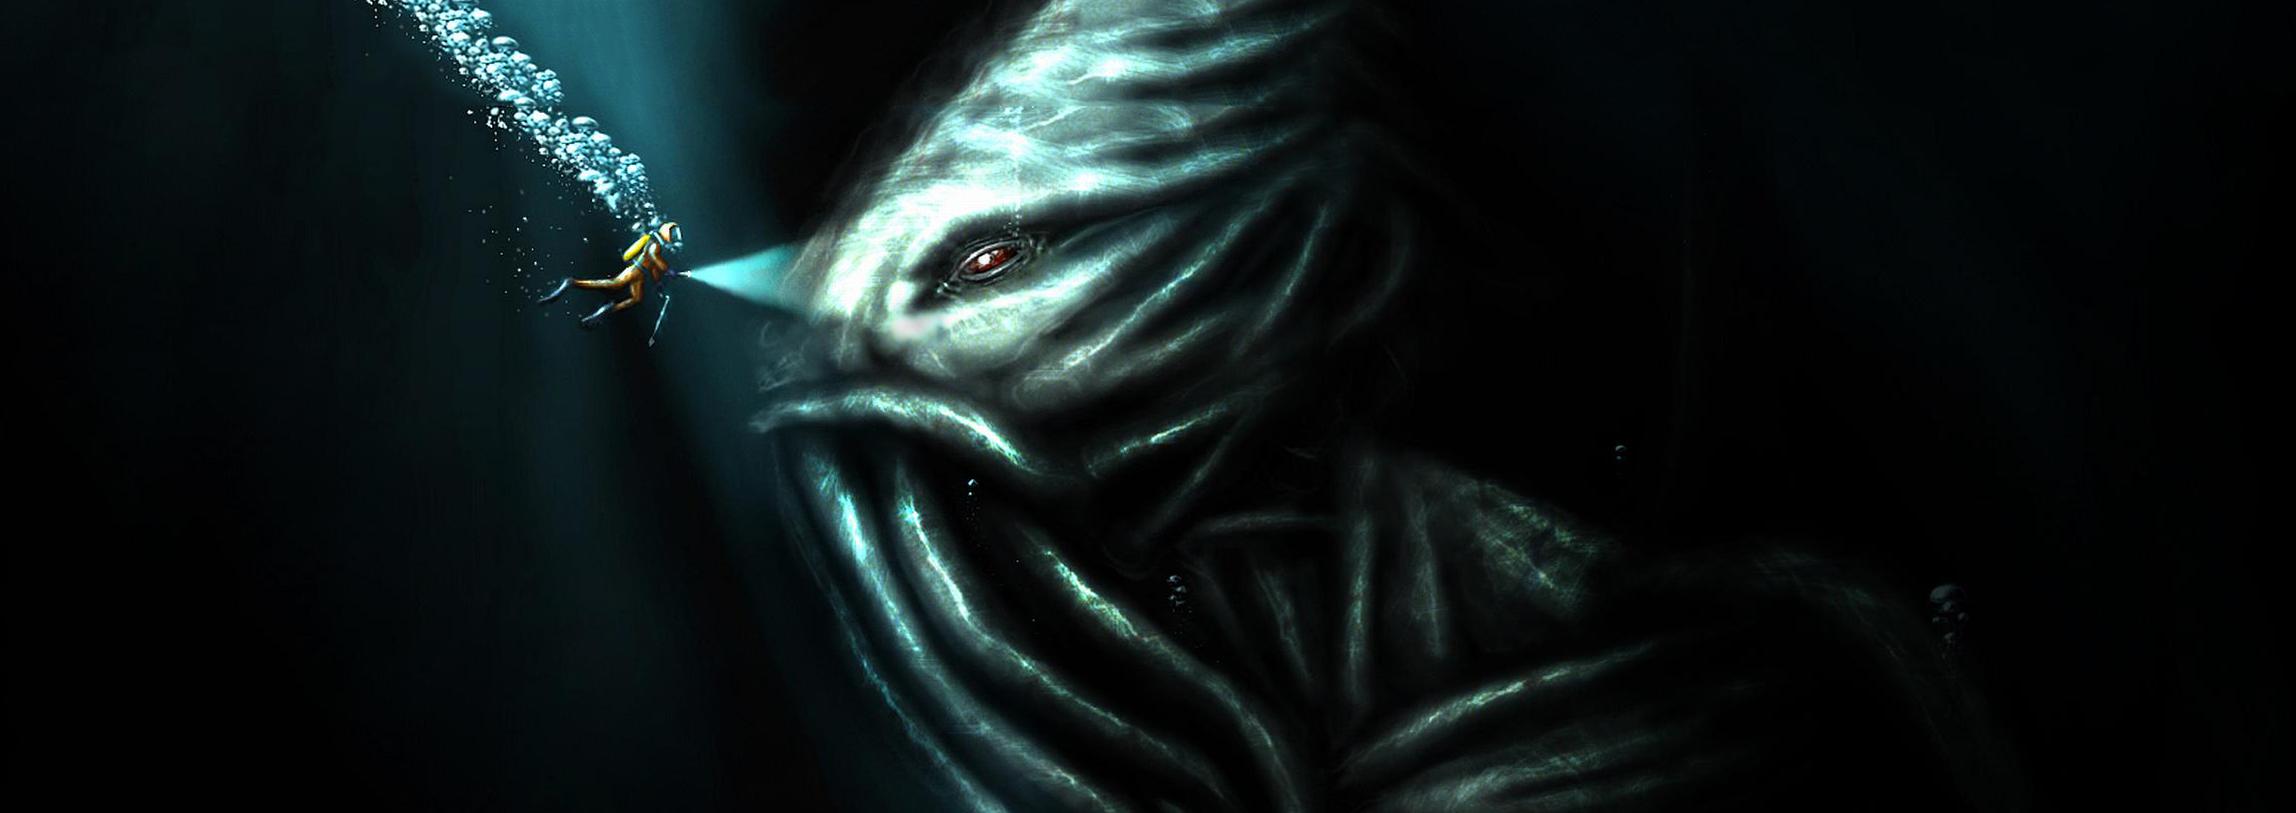 Real Life Kraken The Best Ideas About On Pinterest